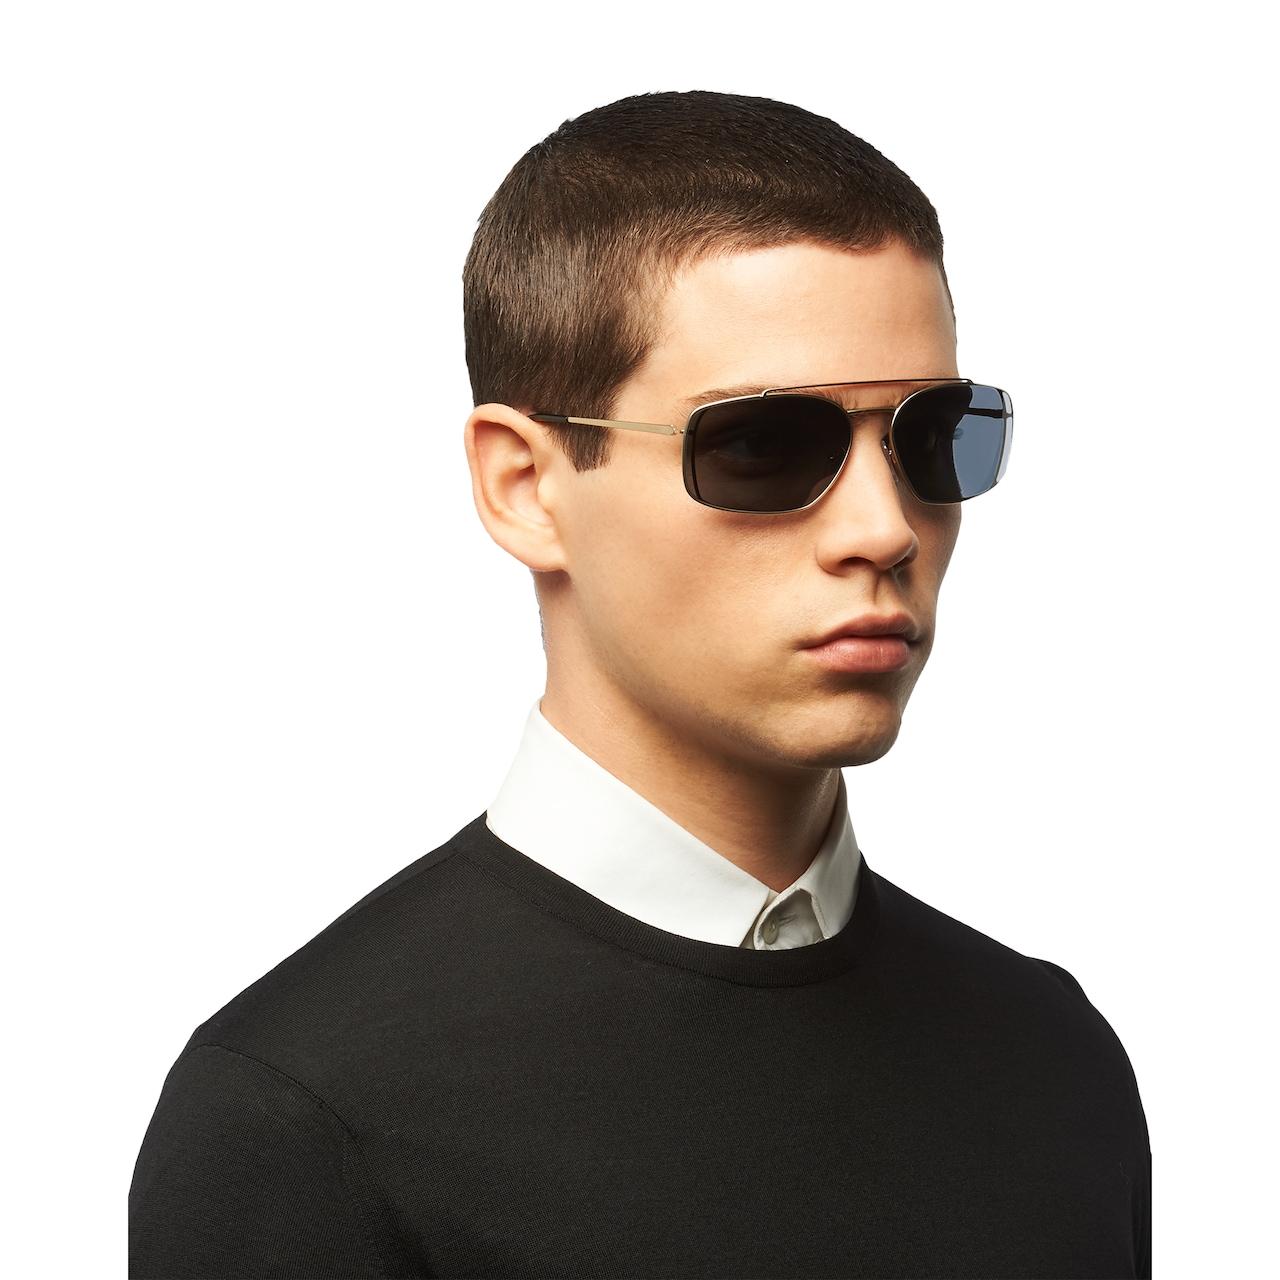 Lunettes de soleil Prada Eyewear Collection